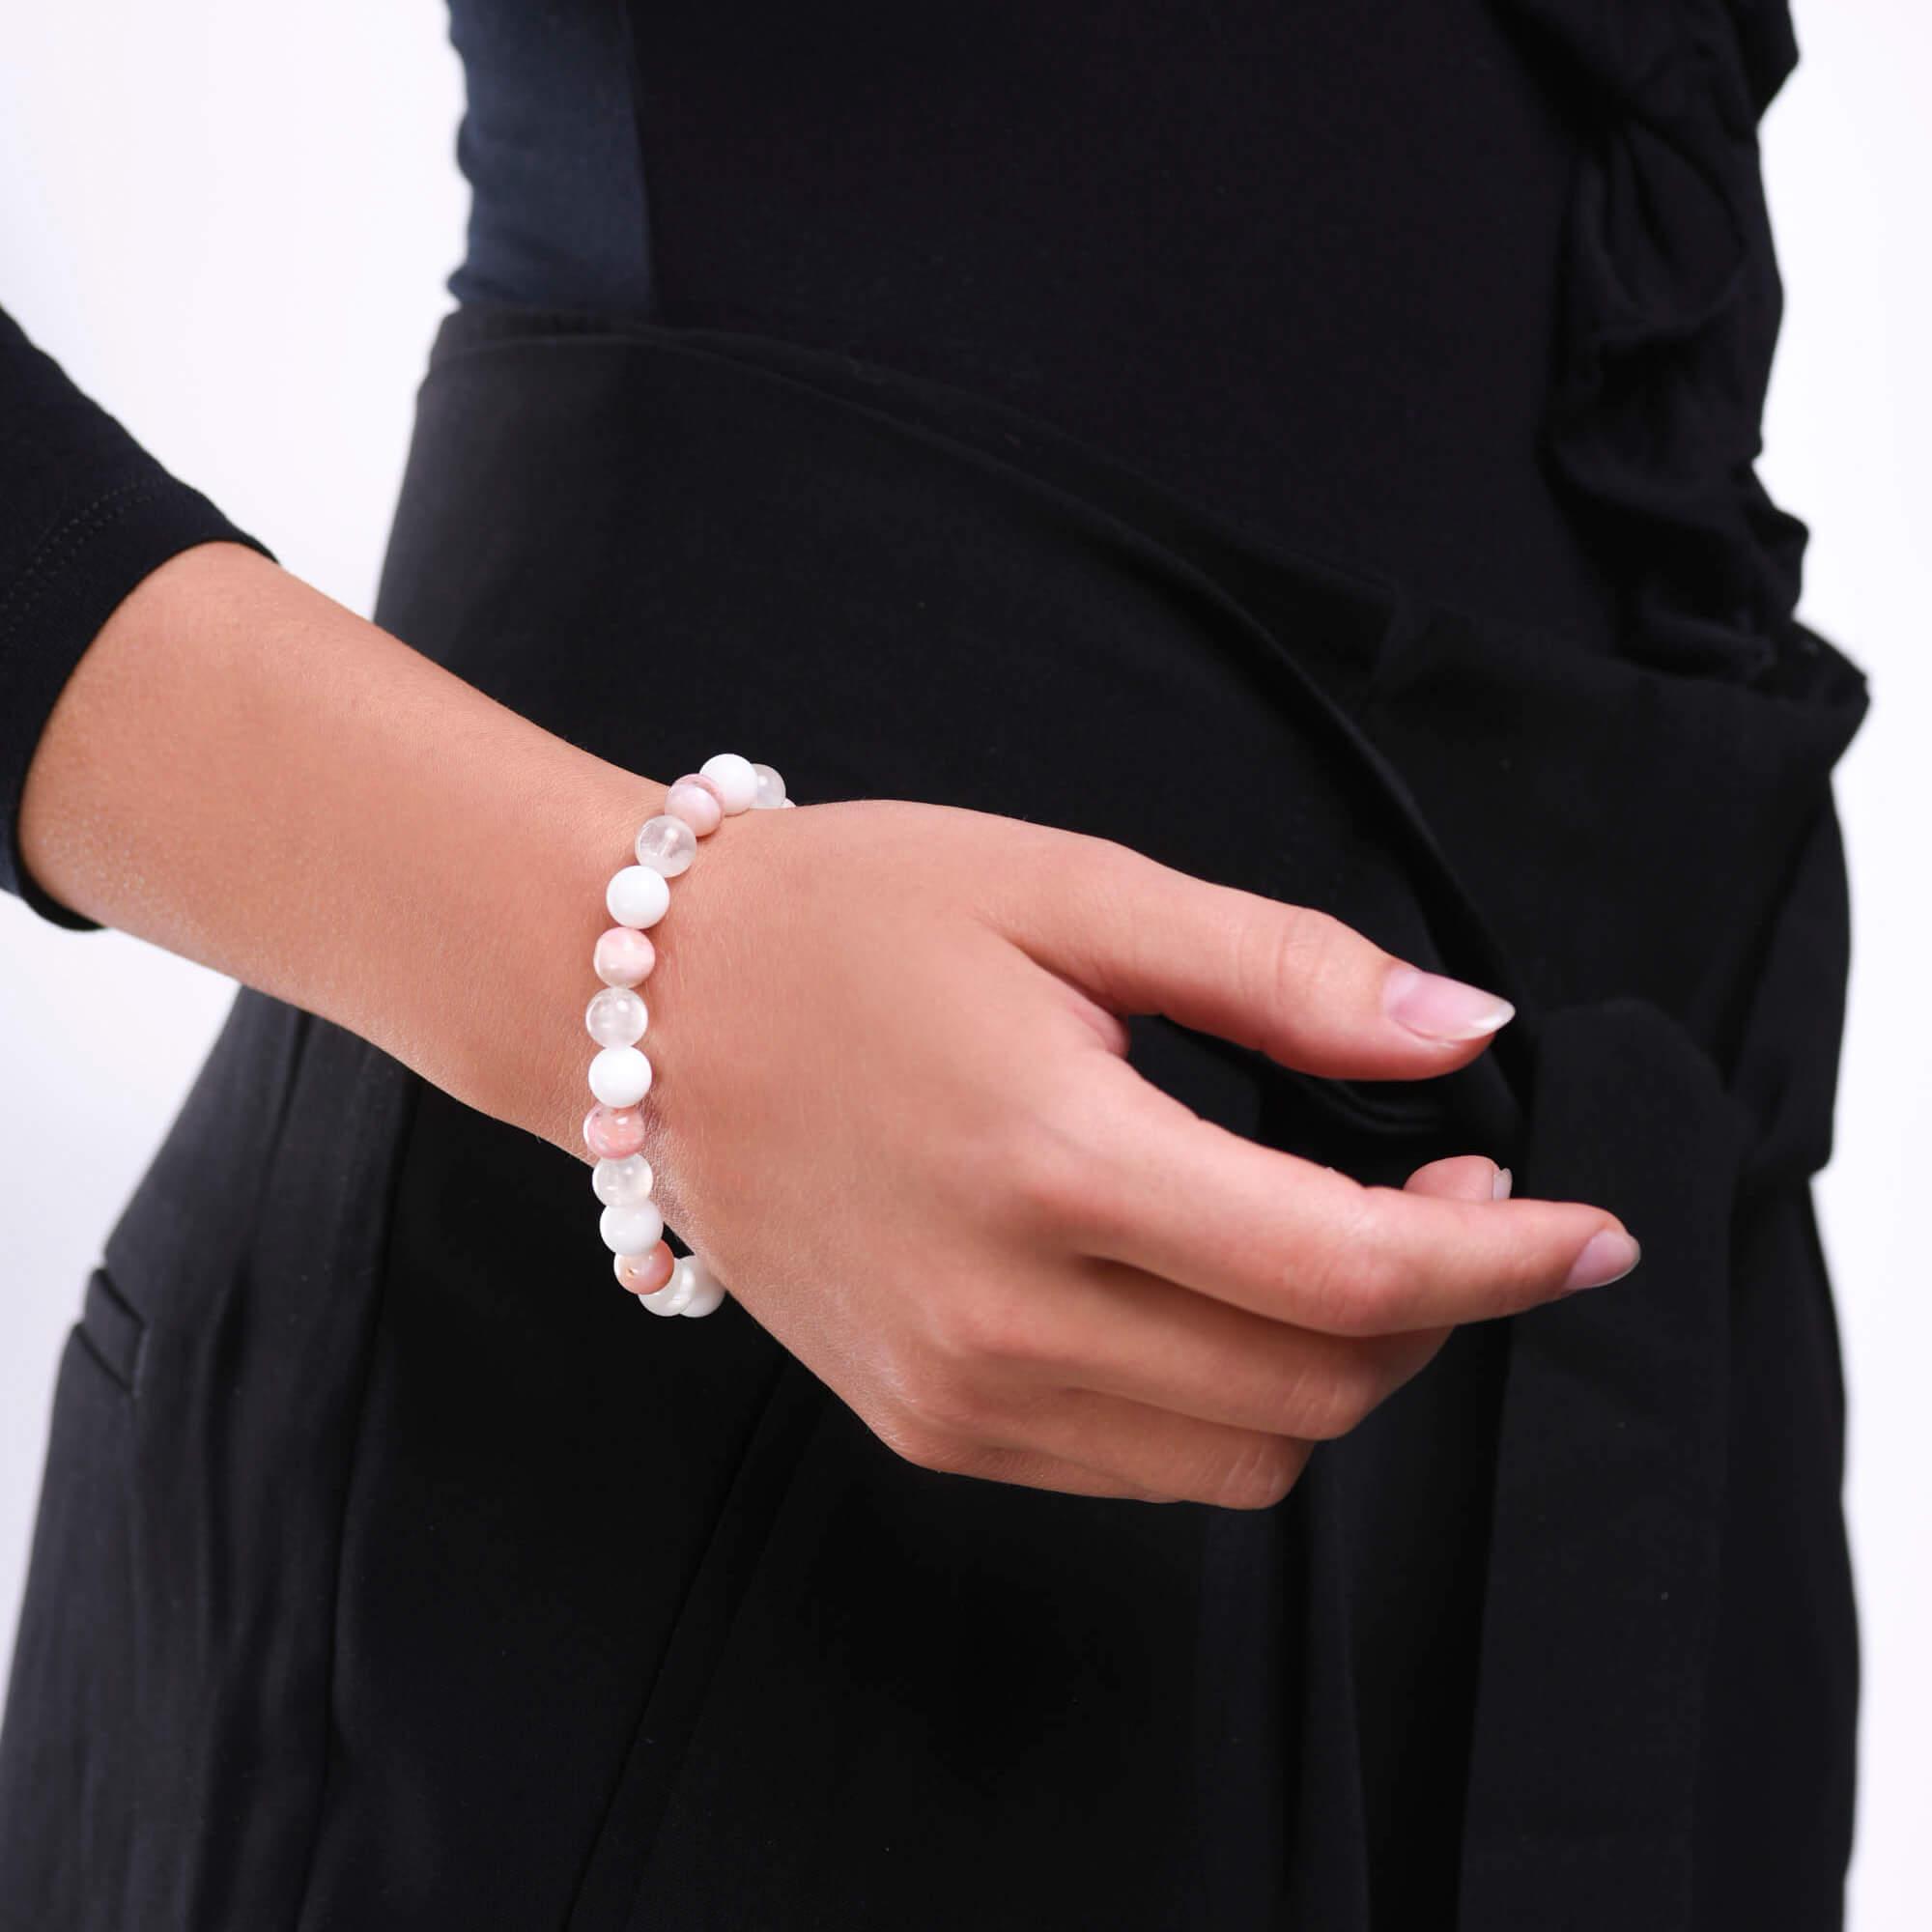 Damsky-koralkovy-naramek-mesicni-kamen-AAAAA-ruzovy-opal-bily-porcelan-bile-zlato-ruka.jpg